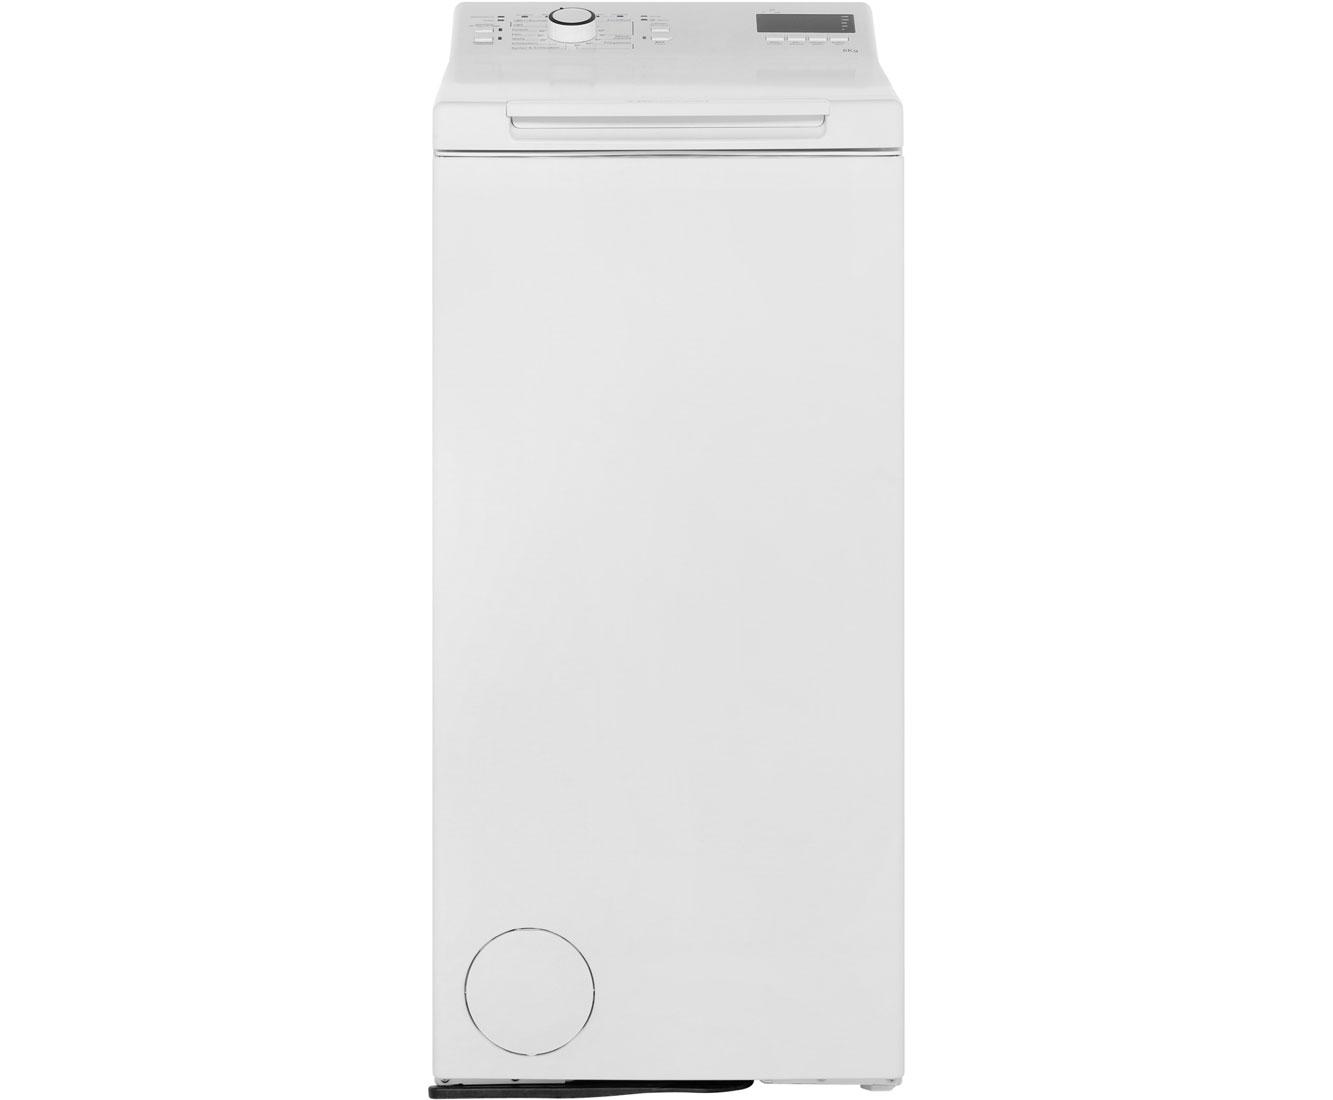 bauknecht wat prime 652 di waschmaschine freistehend weiss neu ebay. Black Bedroom Furniture Sets. Home Design Ideas